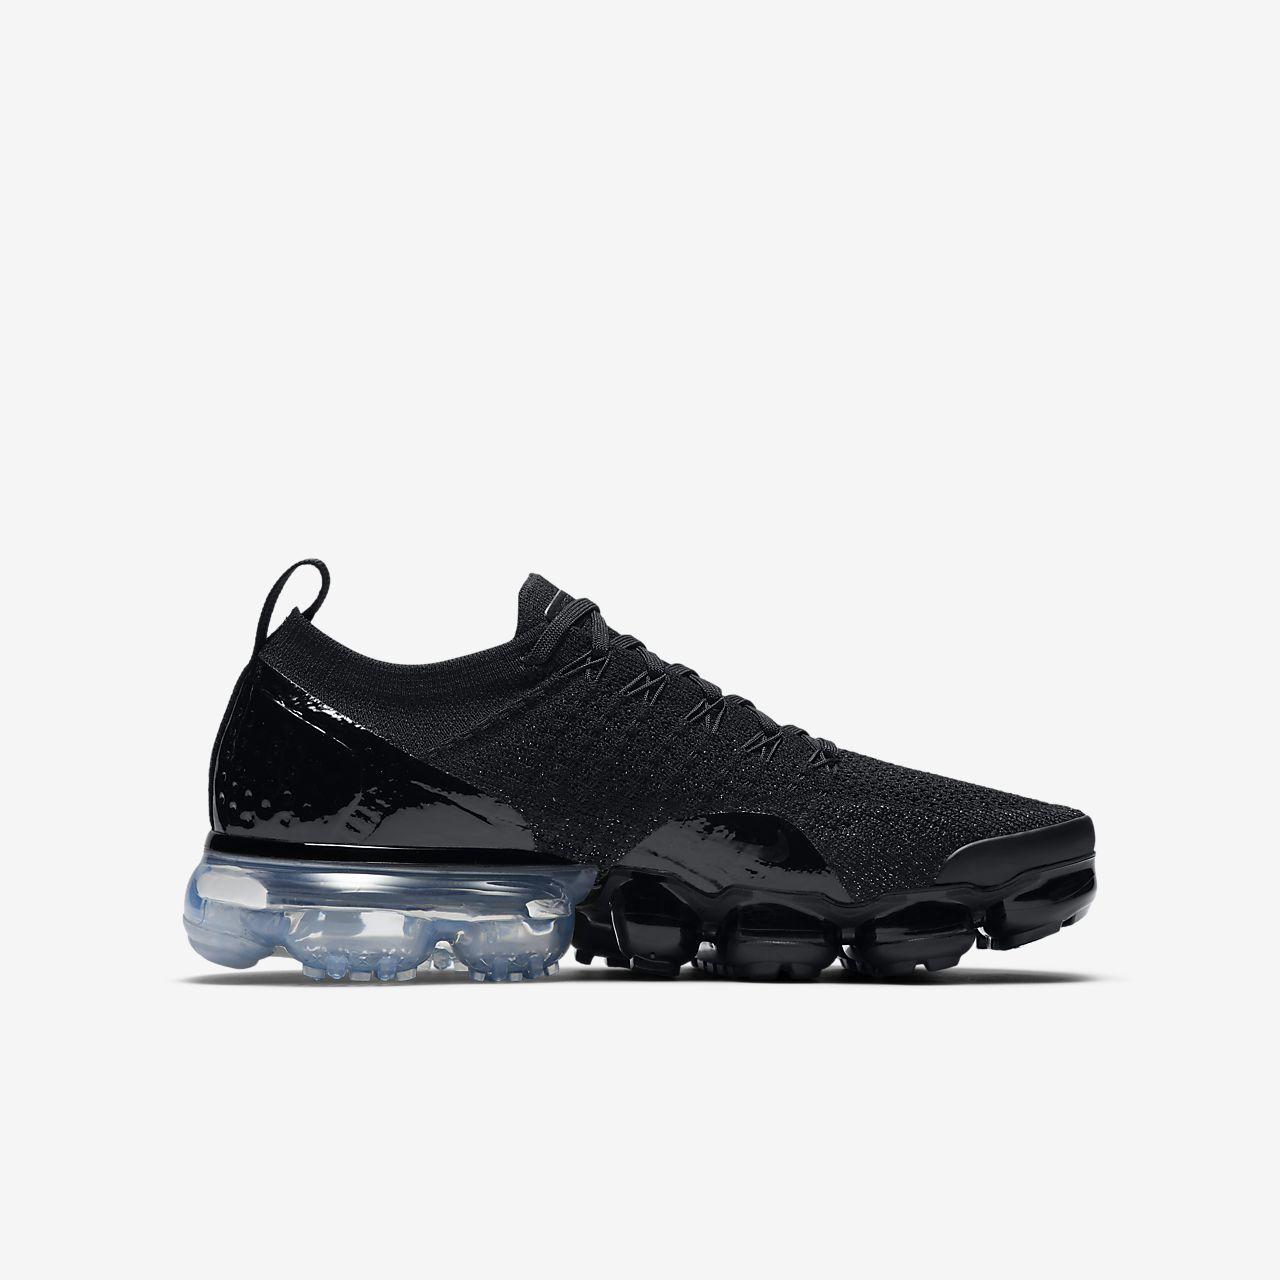 35fffd4551 Nike Air VaporMax Flyknit 2 Women's Shoe